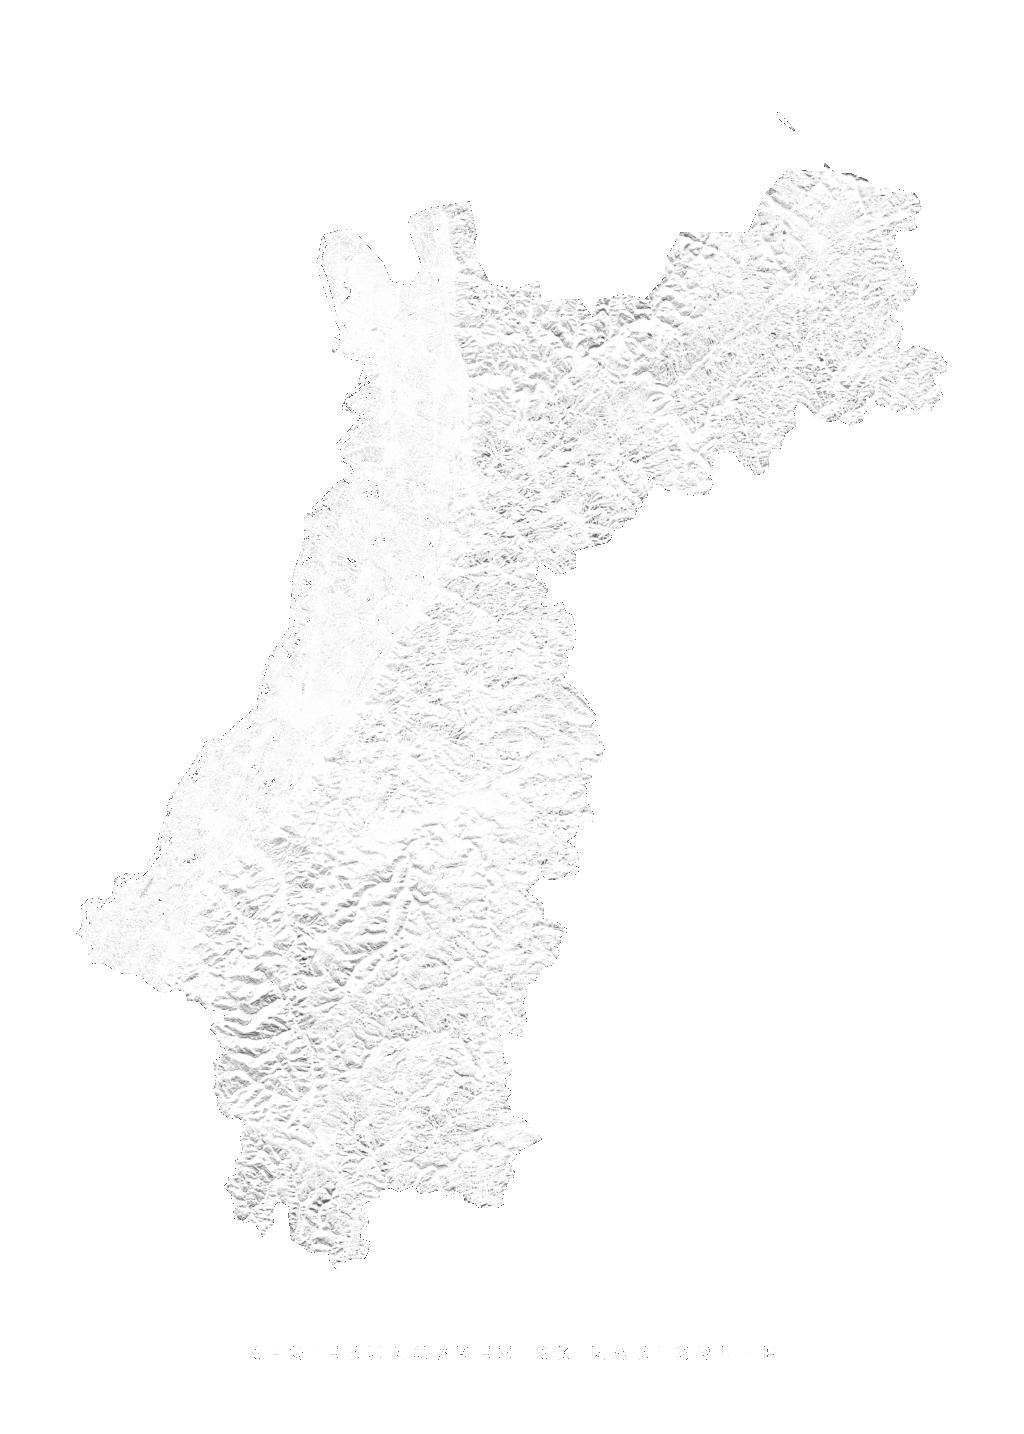 Regierungsbezirk Karlsruhe wall map